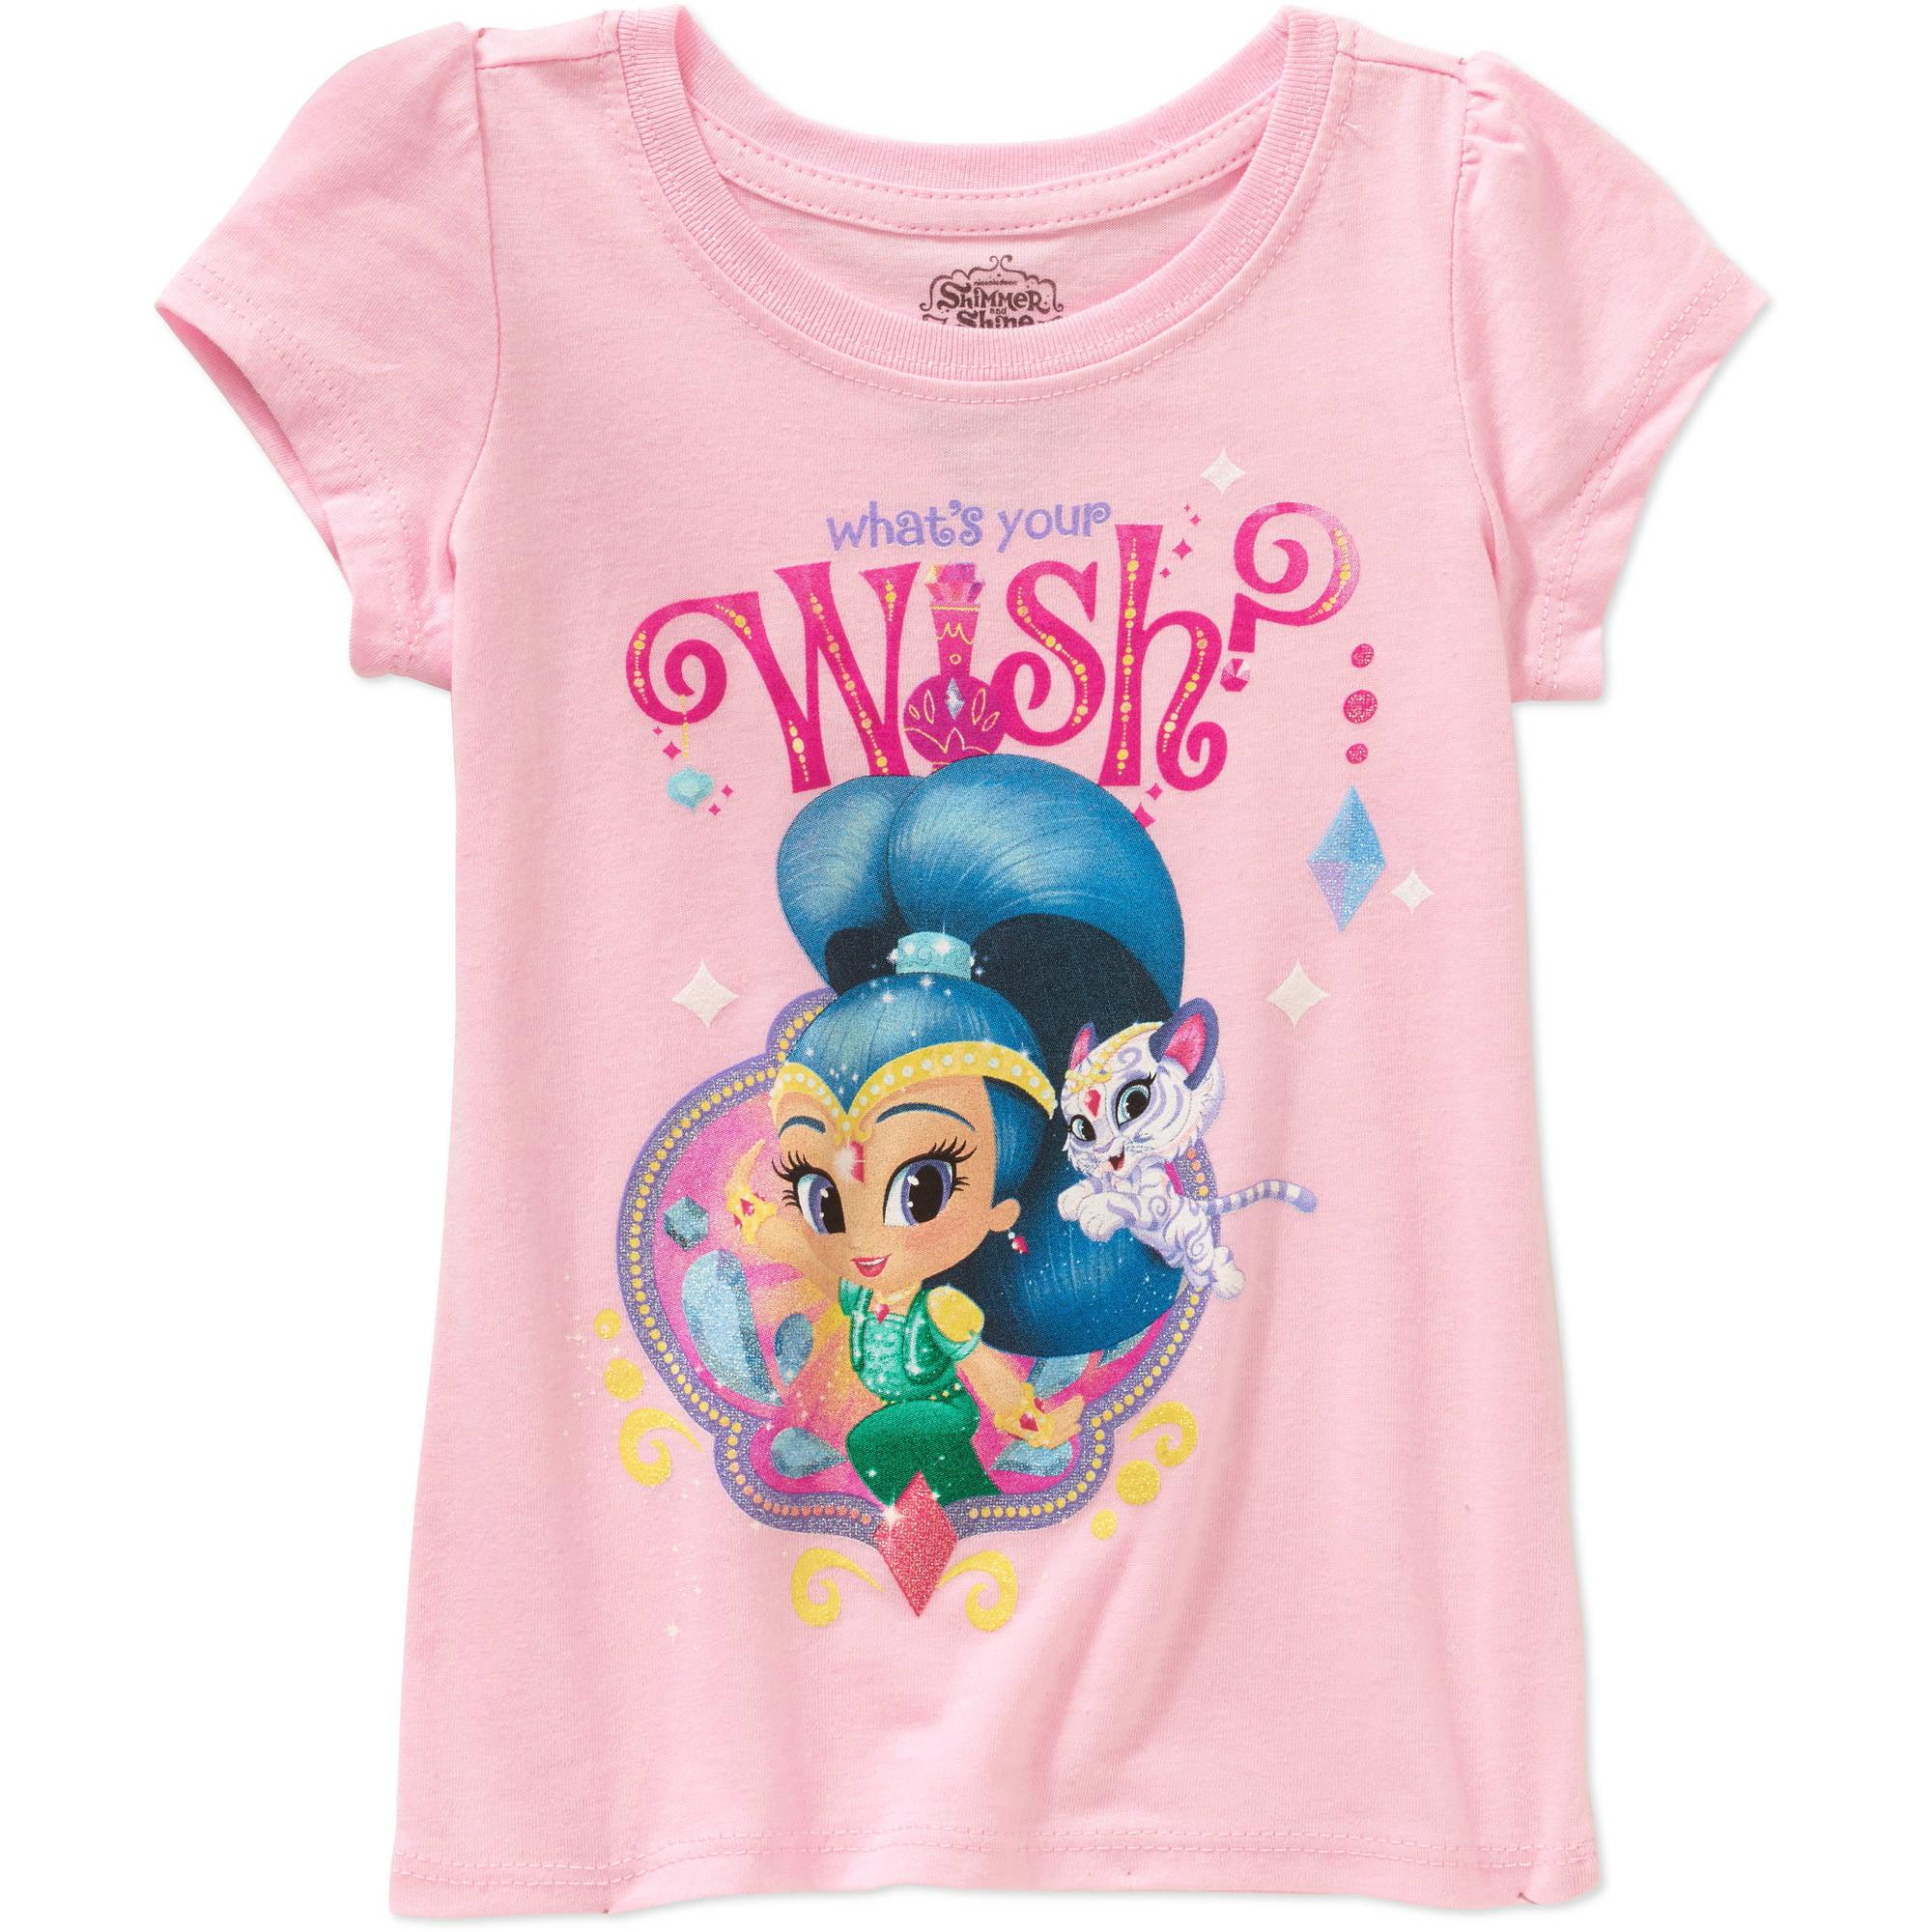 "Nickelodeon Shimmer & Shine ""What's Your Wish?"" Toddler Girls' Short Sleeve Graphic Tee"